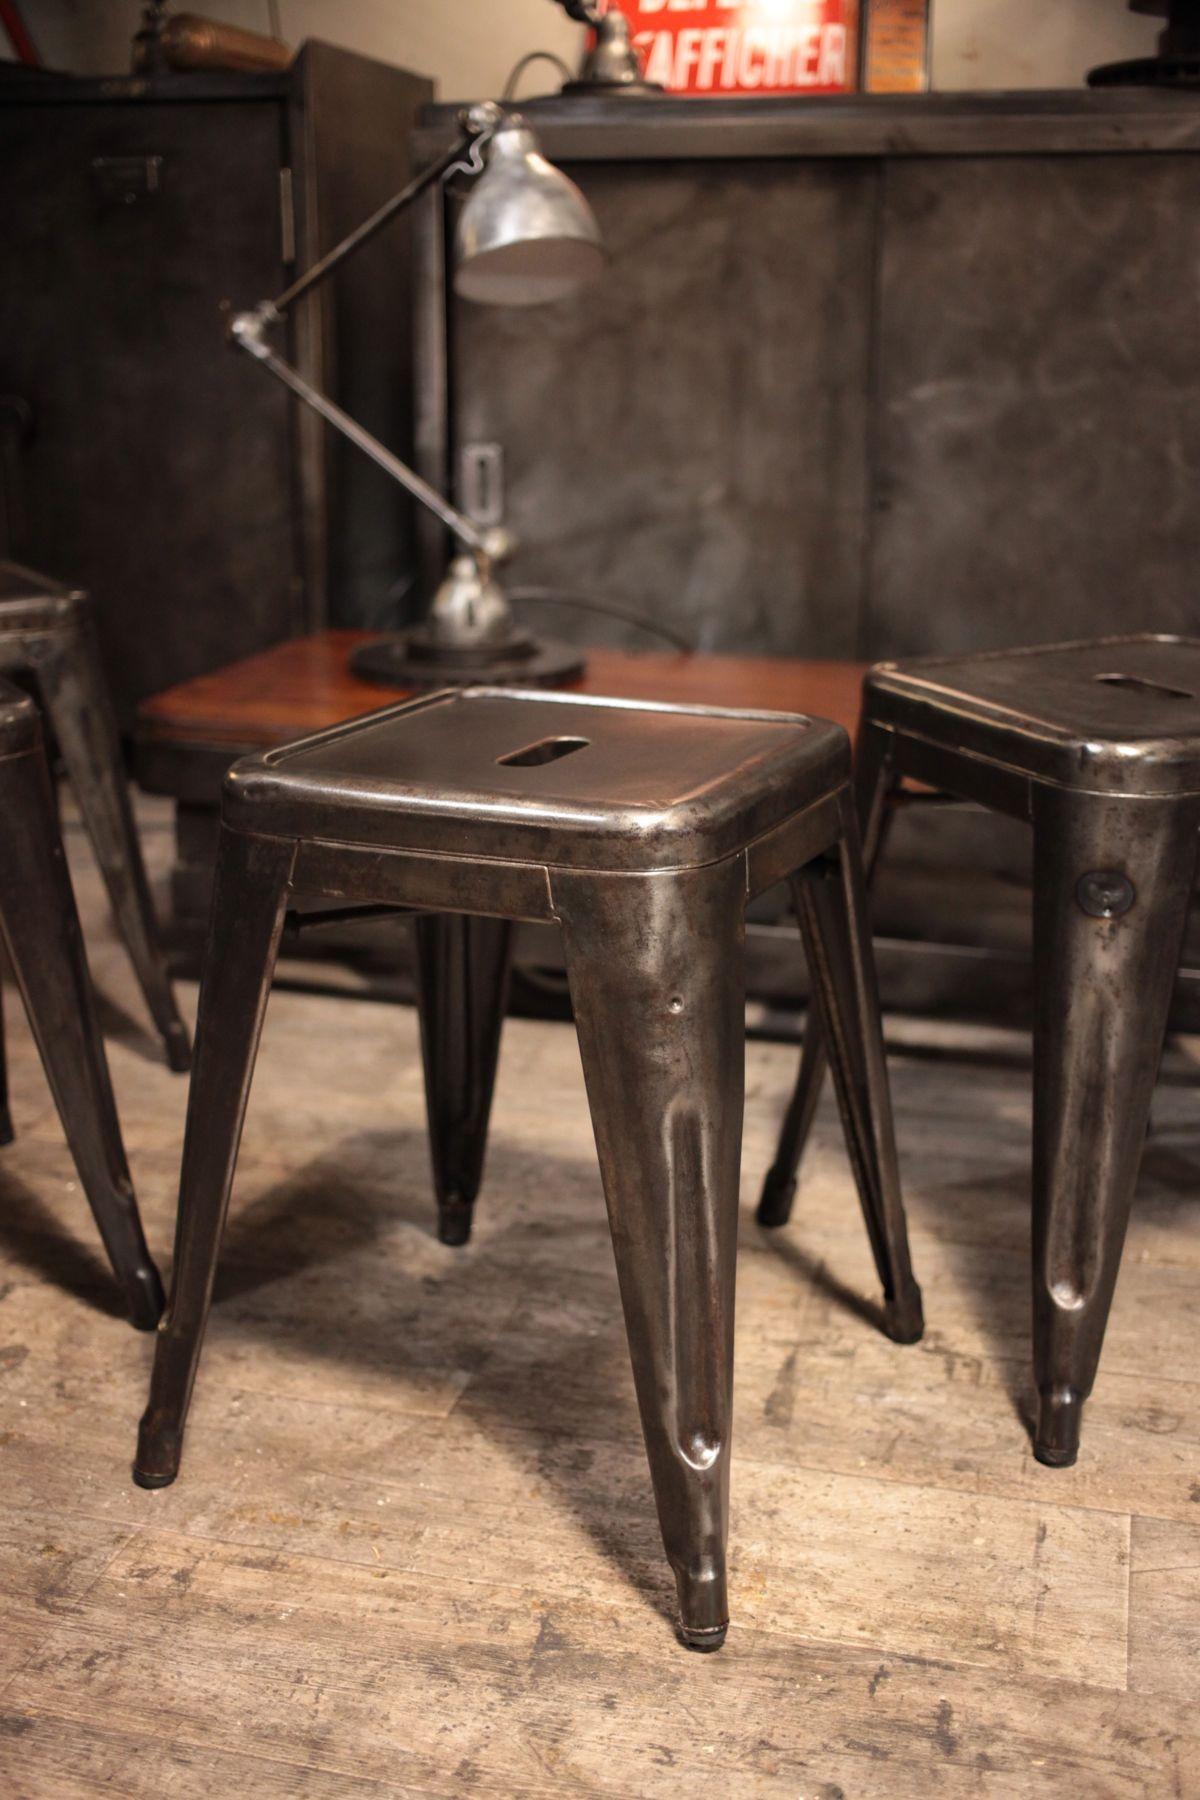 tabouret ancien tolix industrial chic pinterest industrial industrial chic and industrial. Black Bedroom Furniture Sets. Home Design Ideas